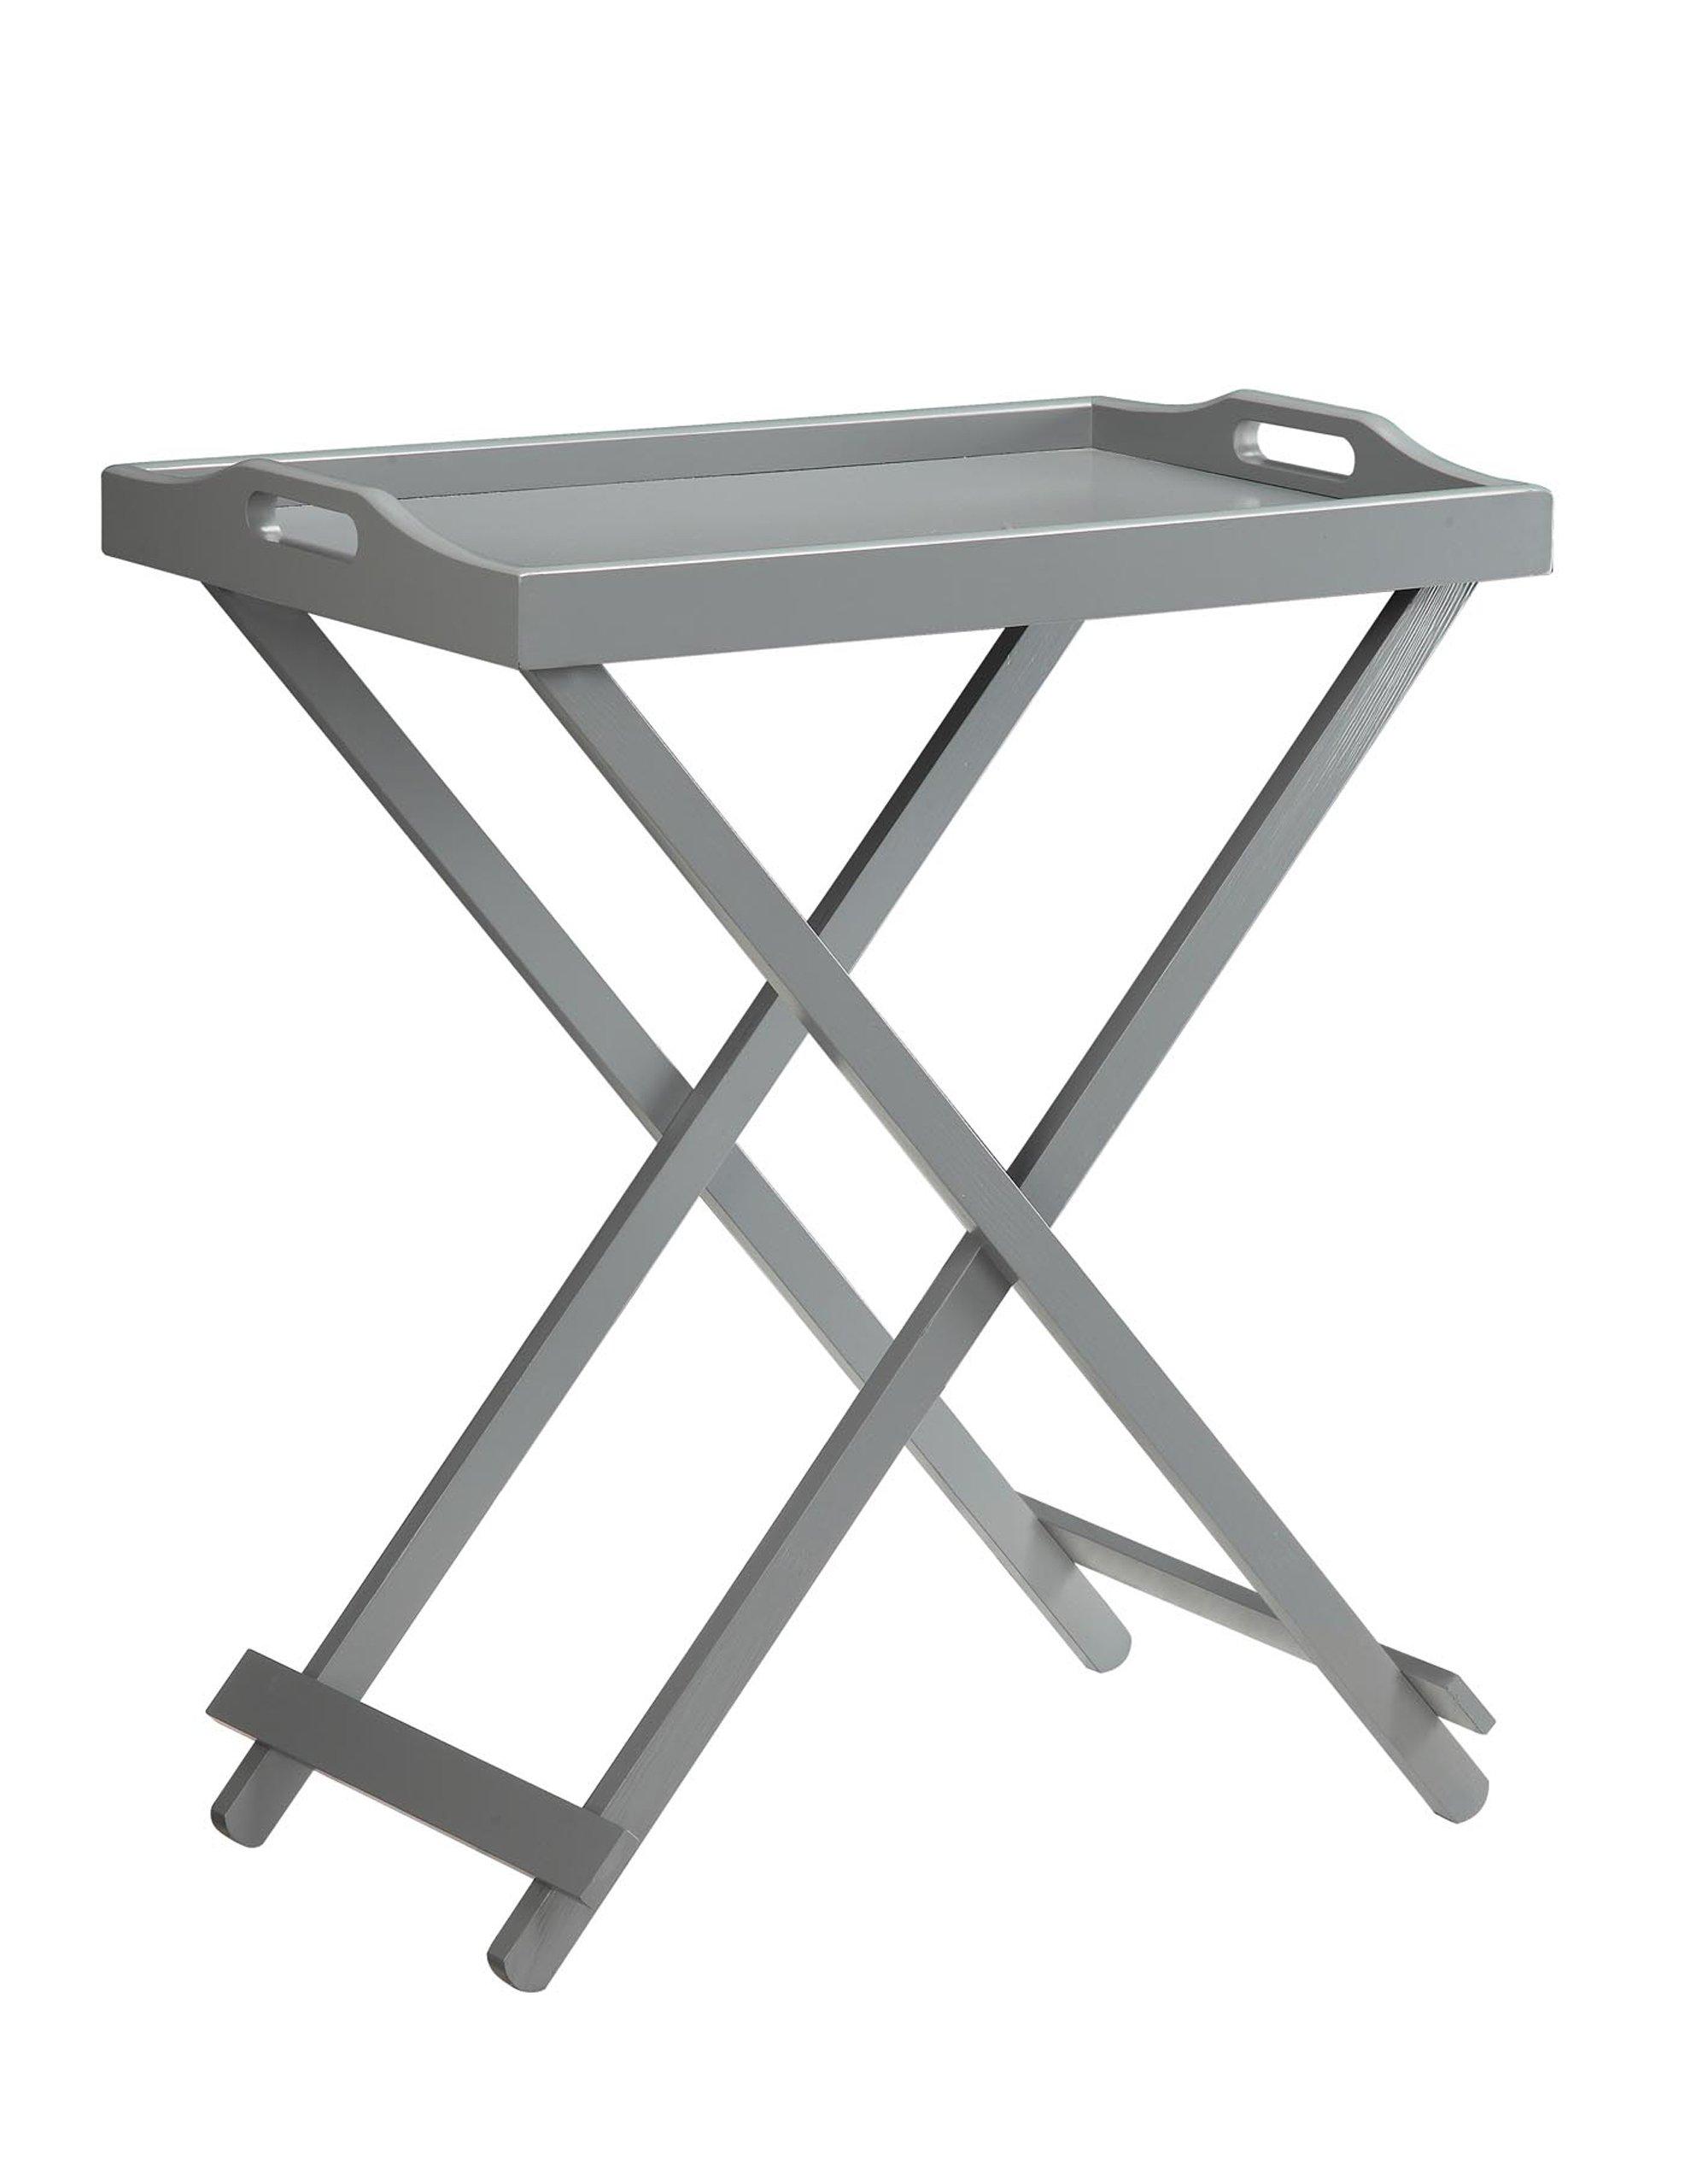 Convenience Concepts Designs2Go Folding Tray Table, Gray